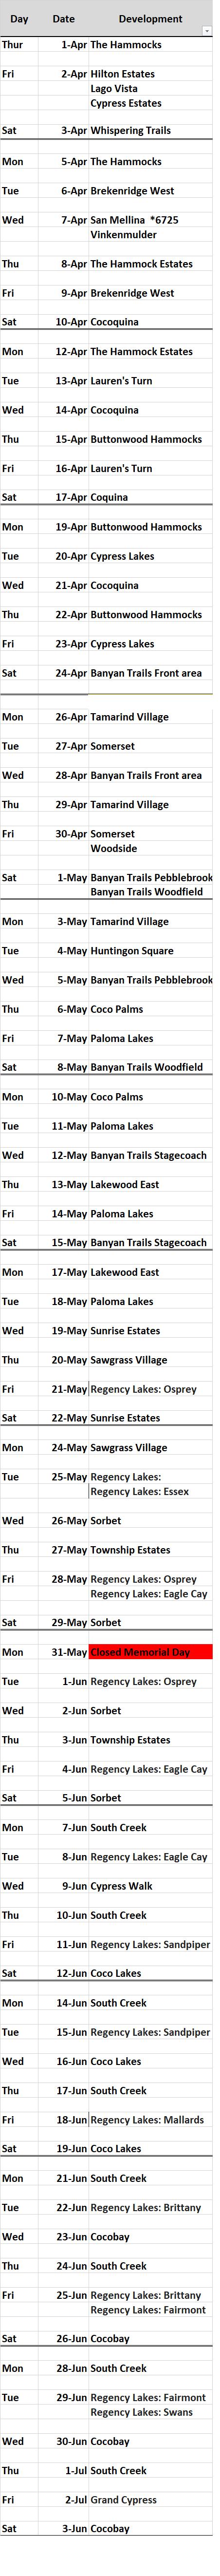 Wix Schedule April thru Jun 21.png